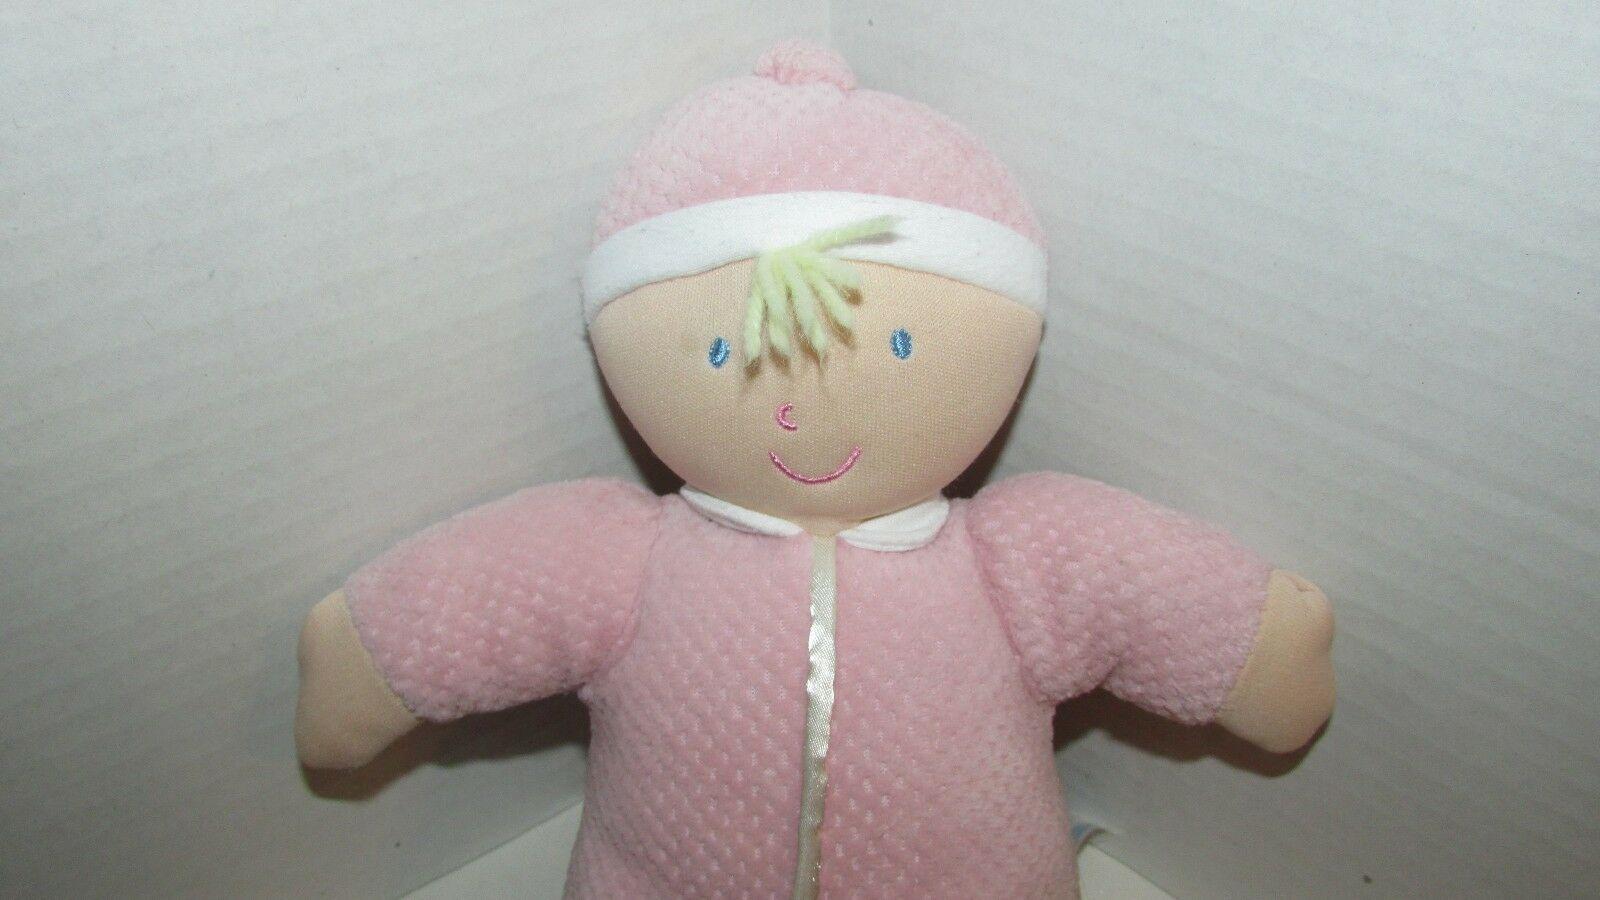 Kids Preferred doll baby soft plush pink thermal satin trim hat blonde hair image 2